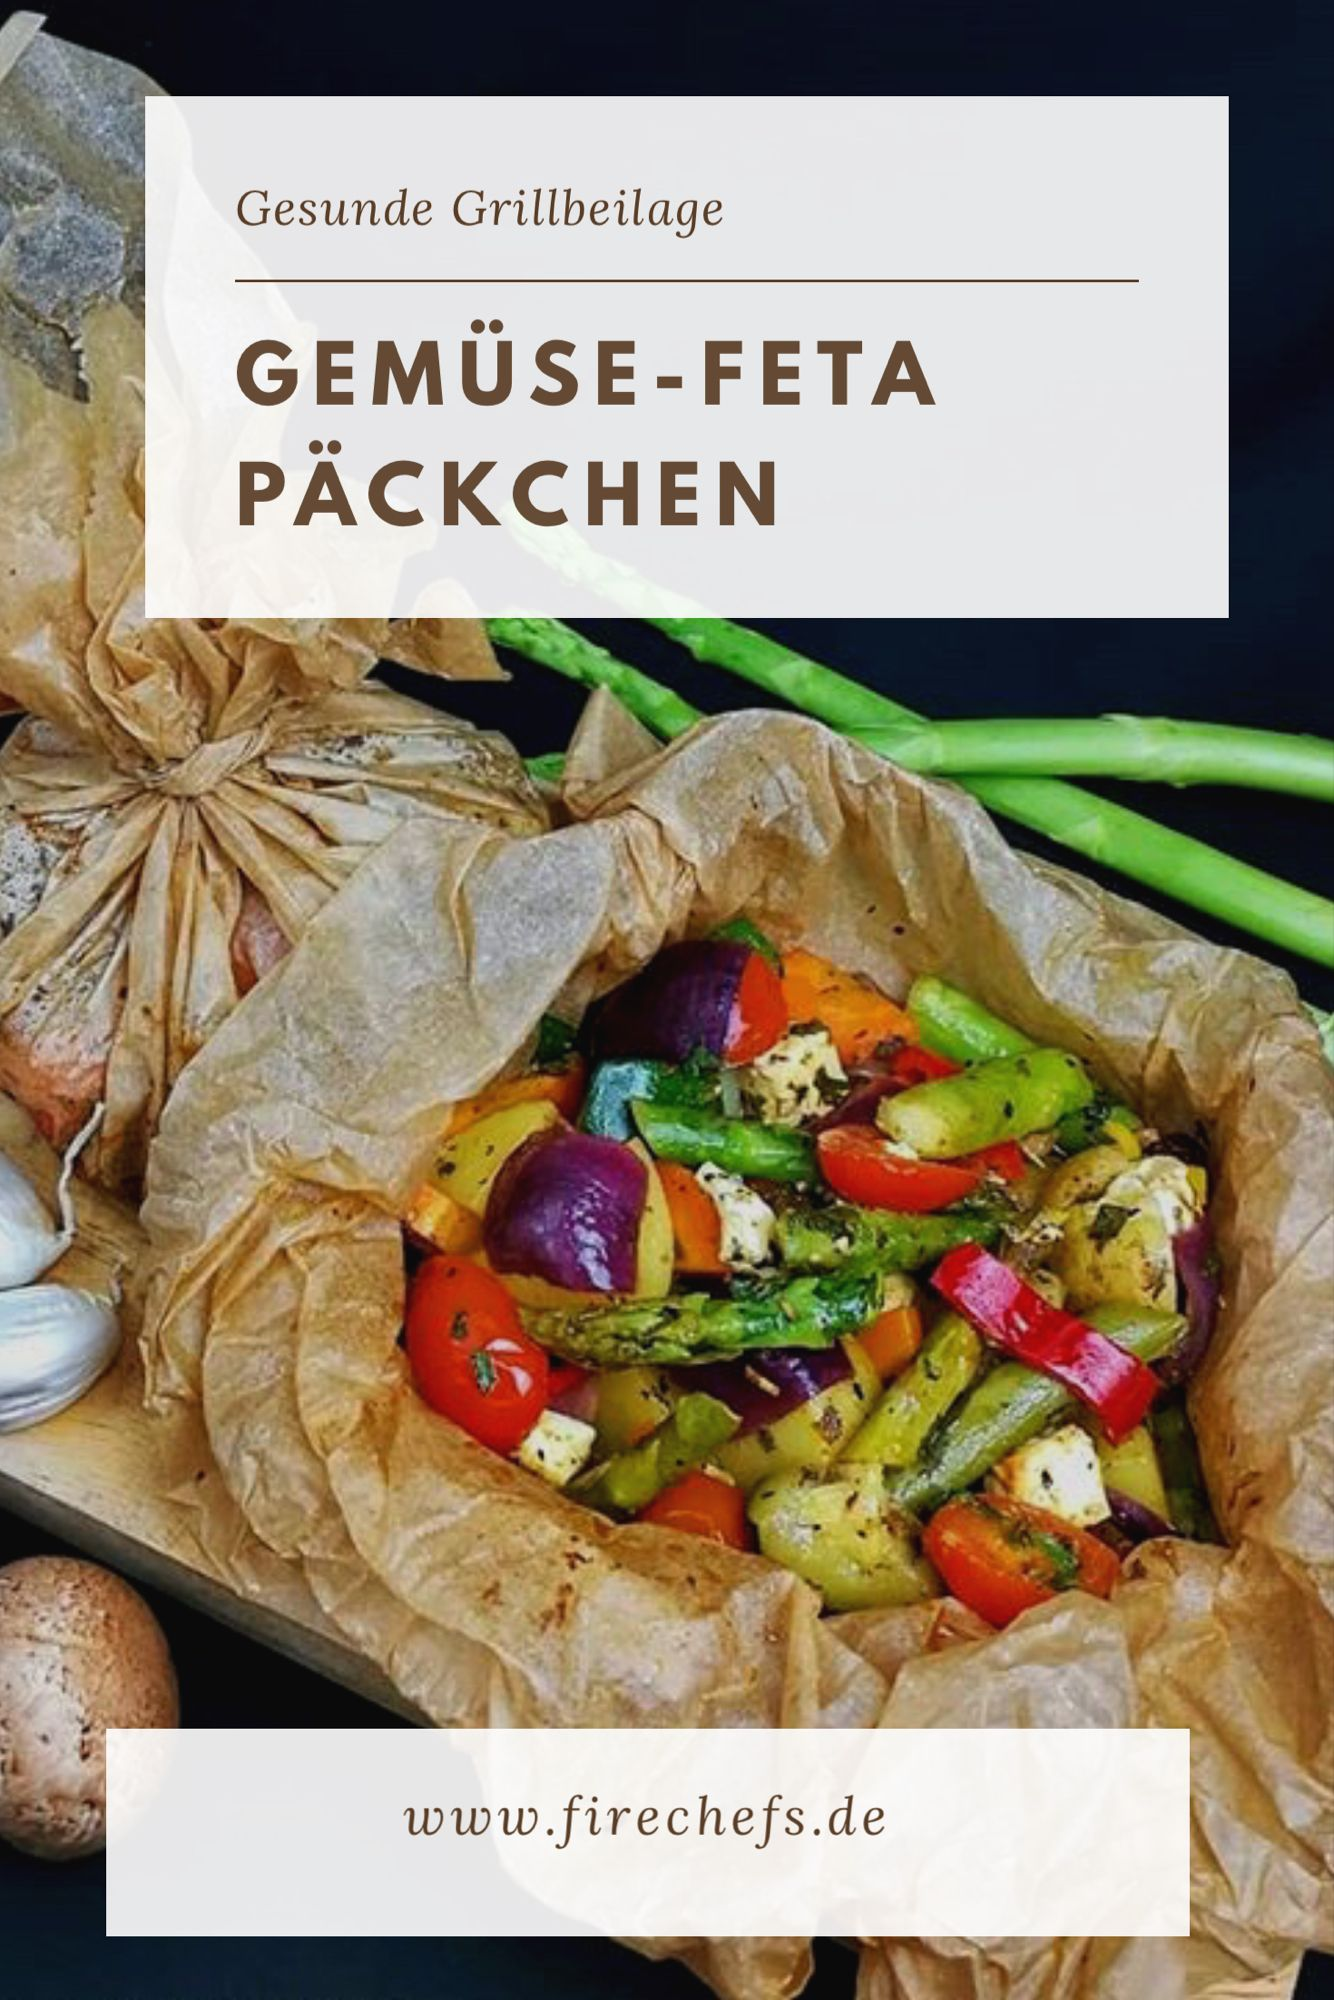 Gemüse-Feta Päckchen